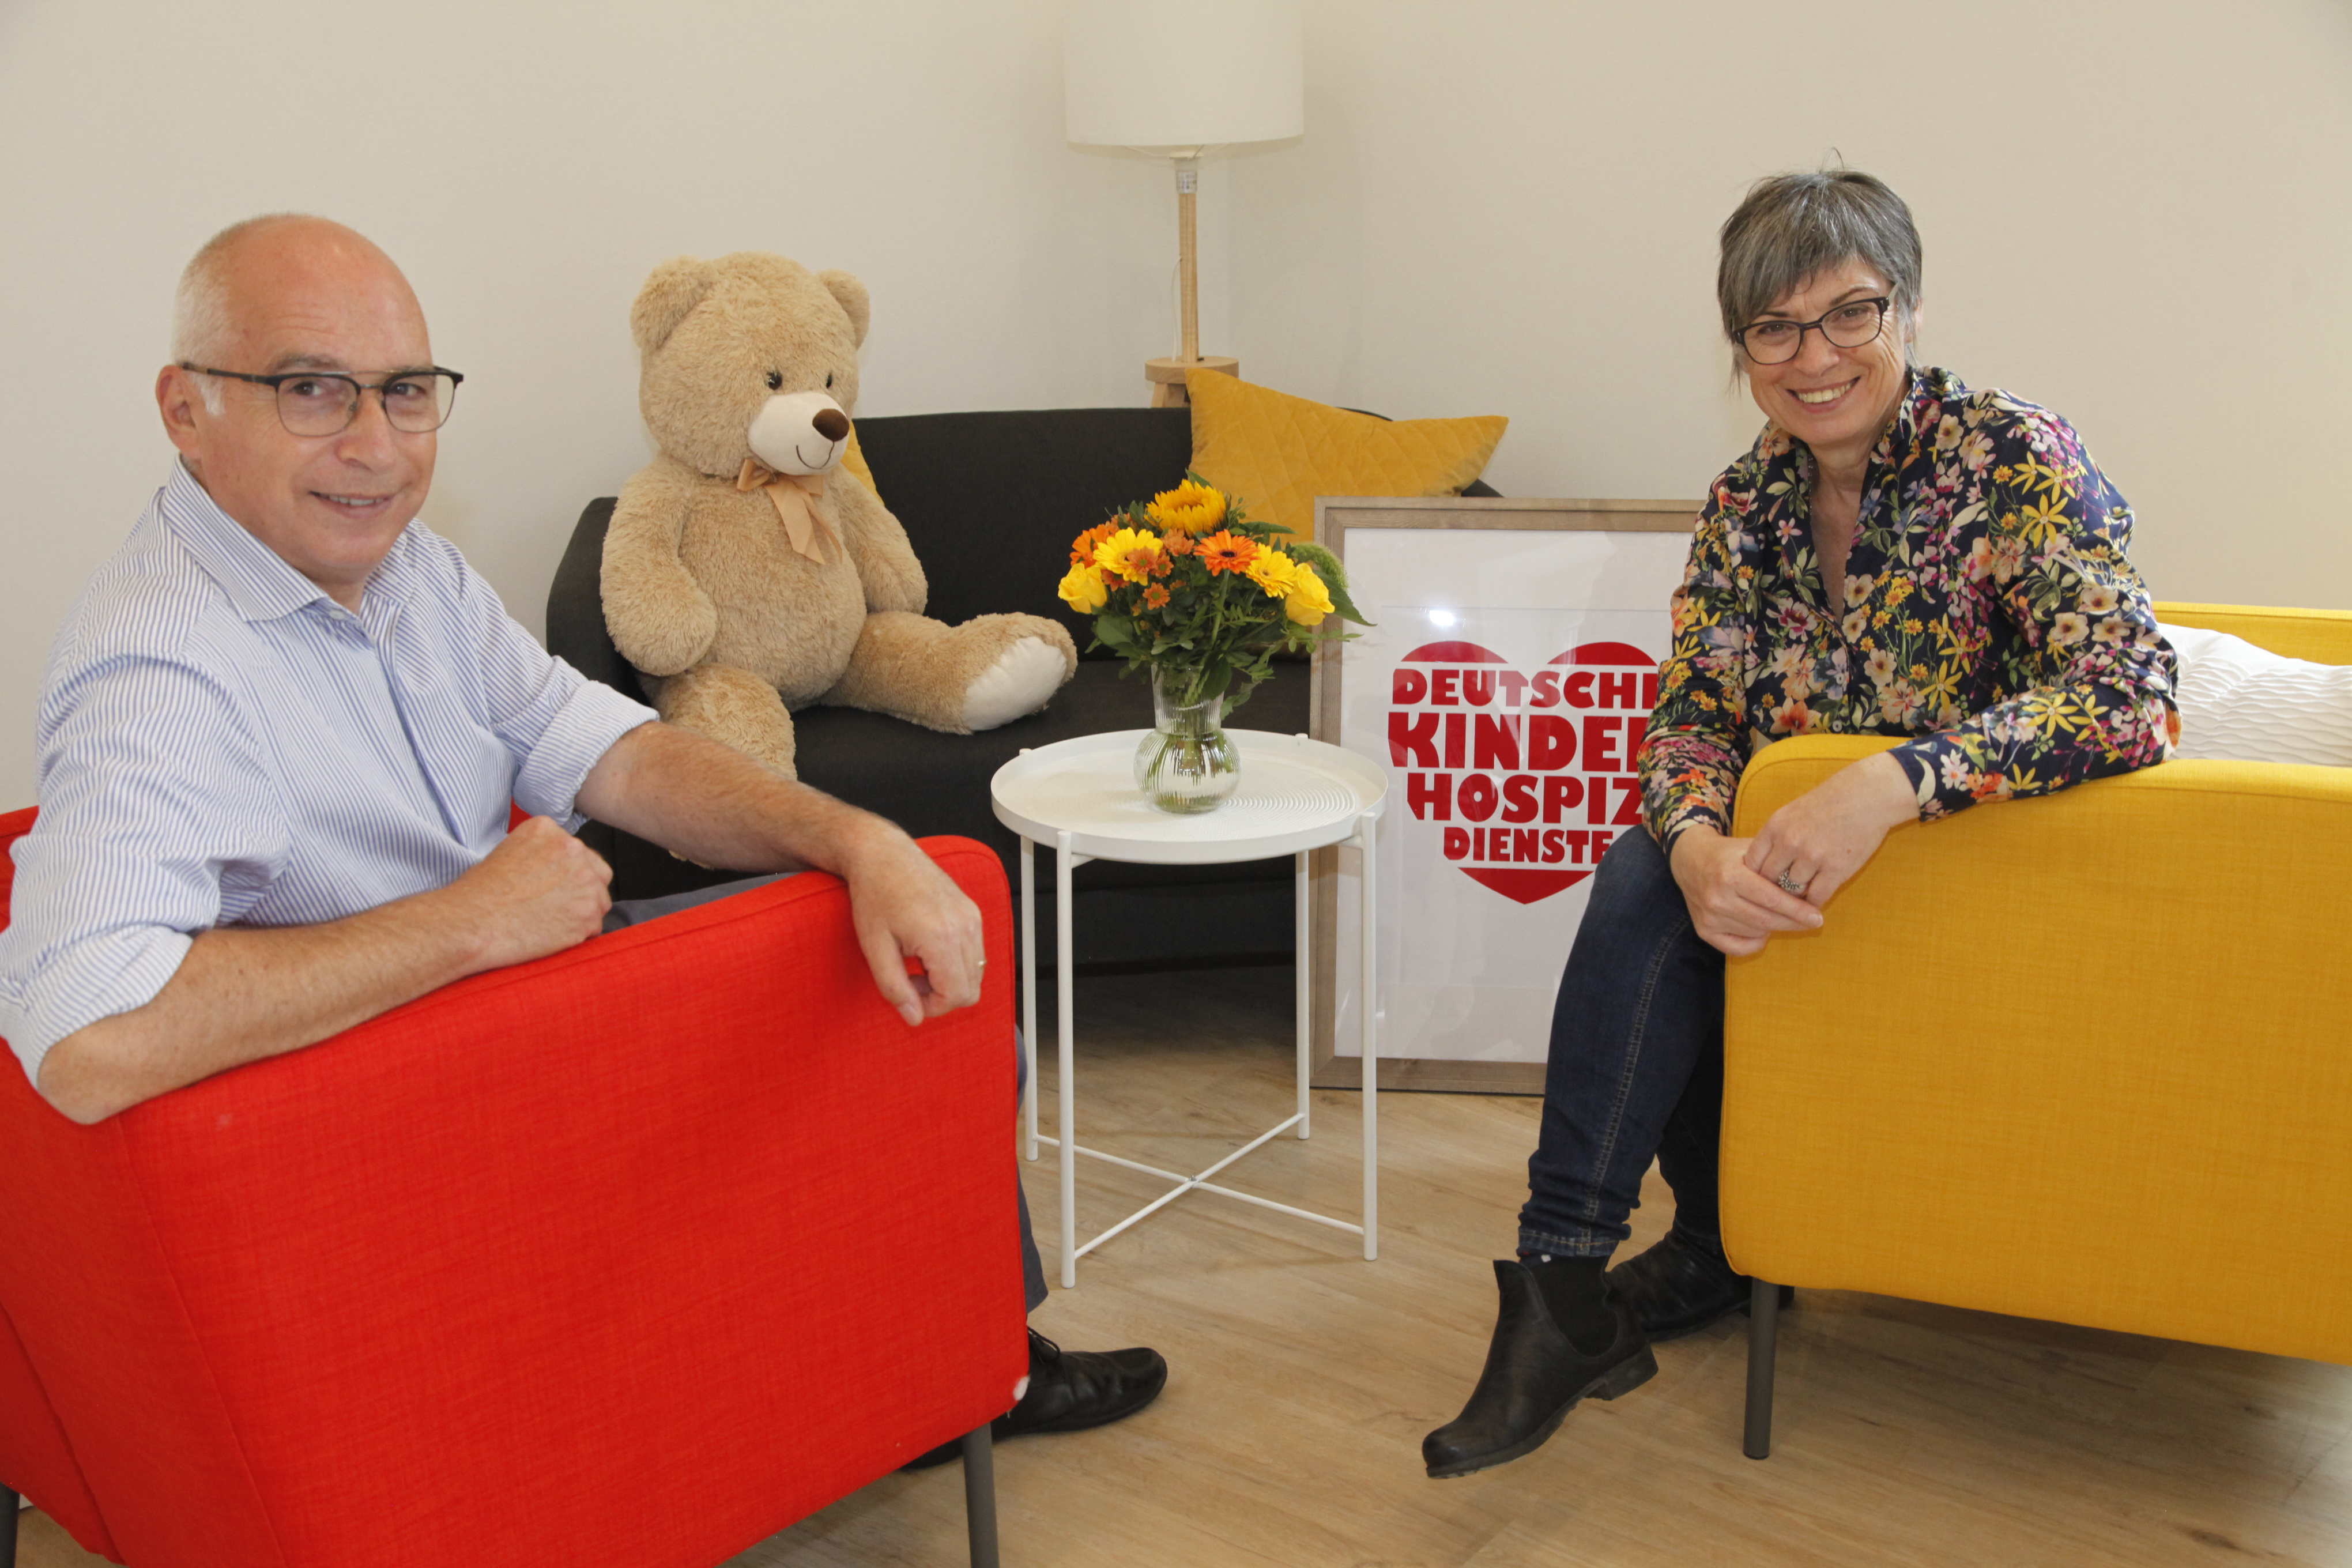 Deutsche Kinderhospiz Dienste